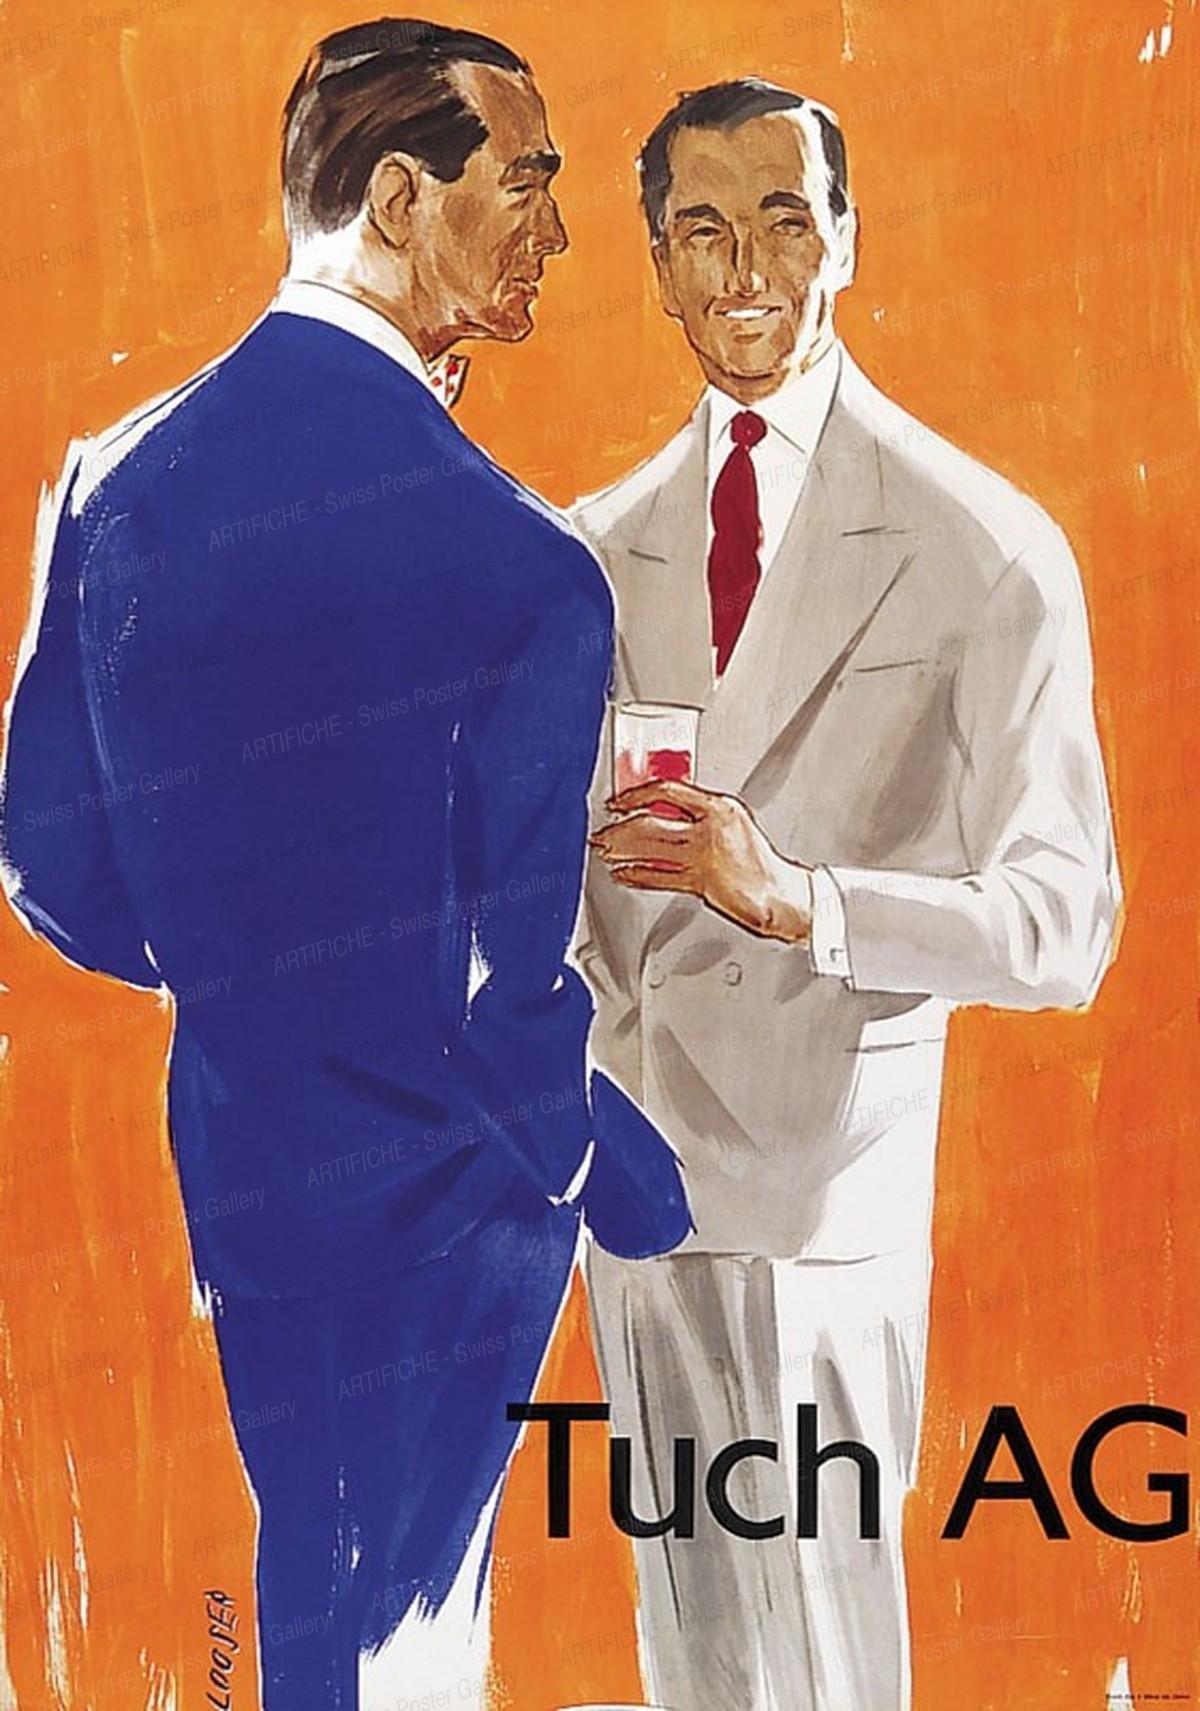 Tuch AG, Hans Looser